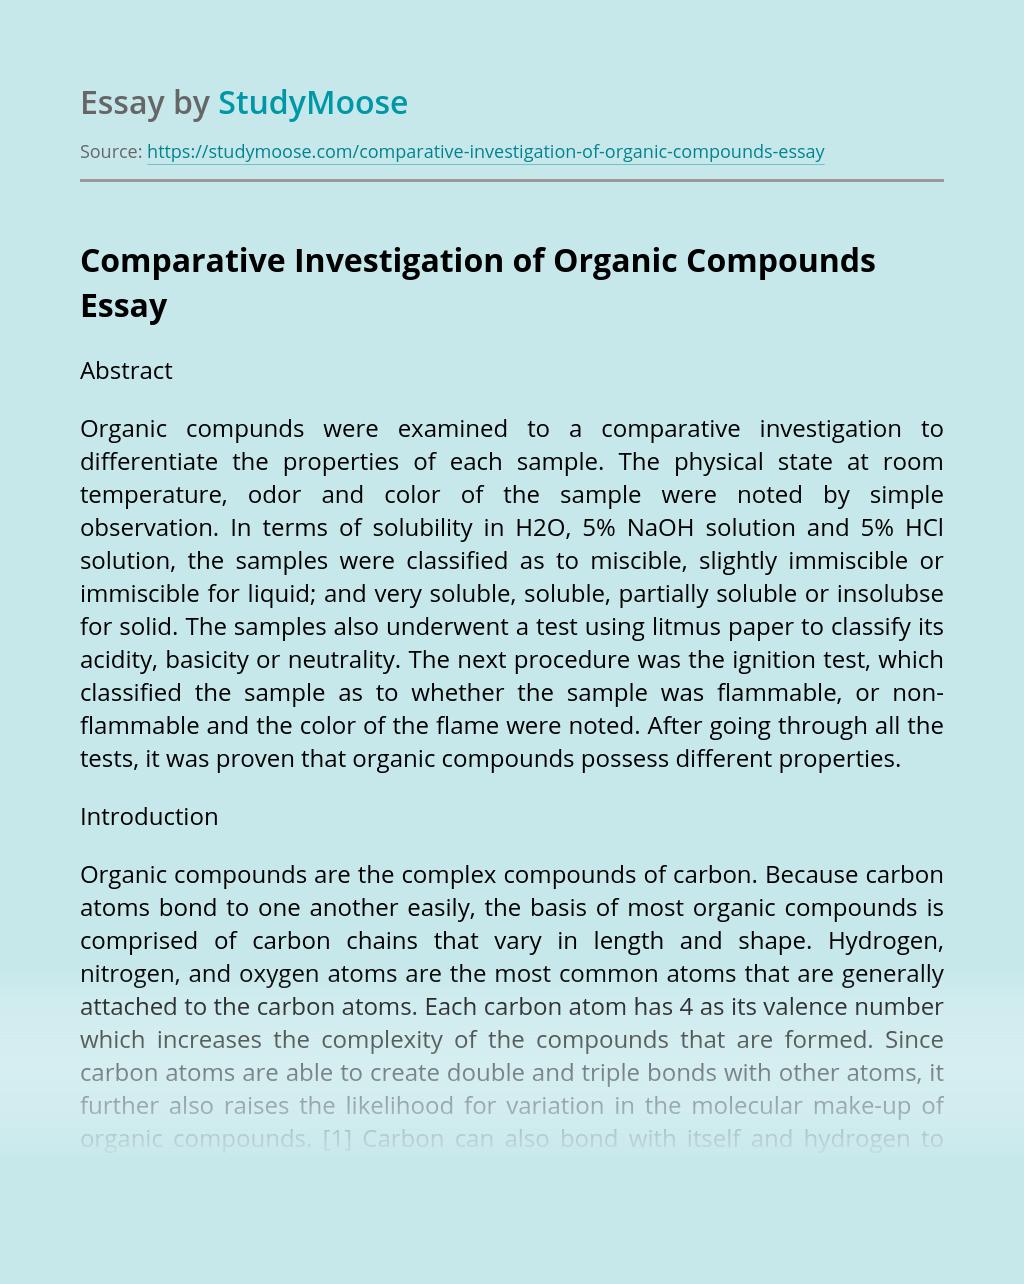 Comparative Investigation of Organic Compounds